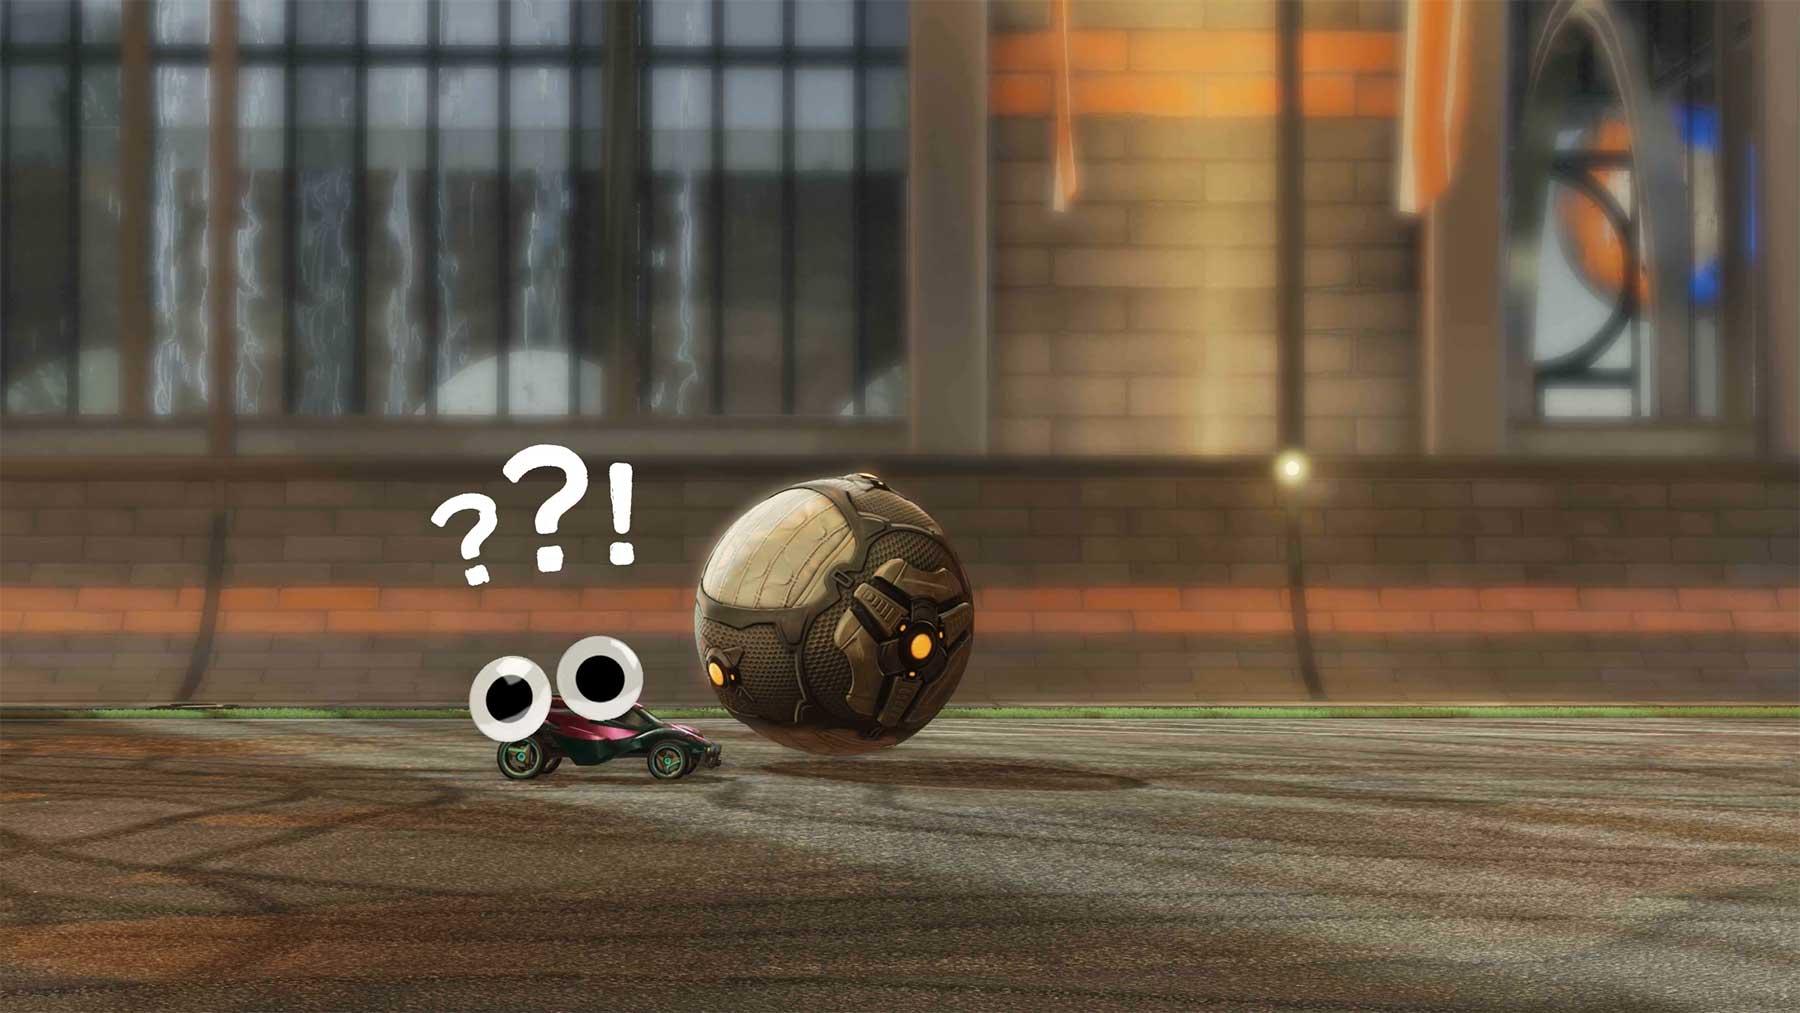 Rocket League, aber du darfst den Ball nur einmal berühren! RL-one-touch-teaser